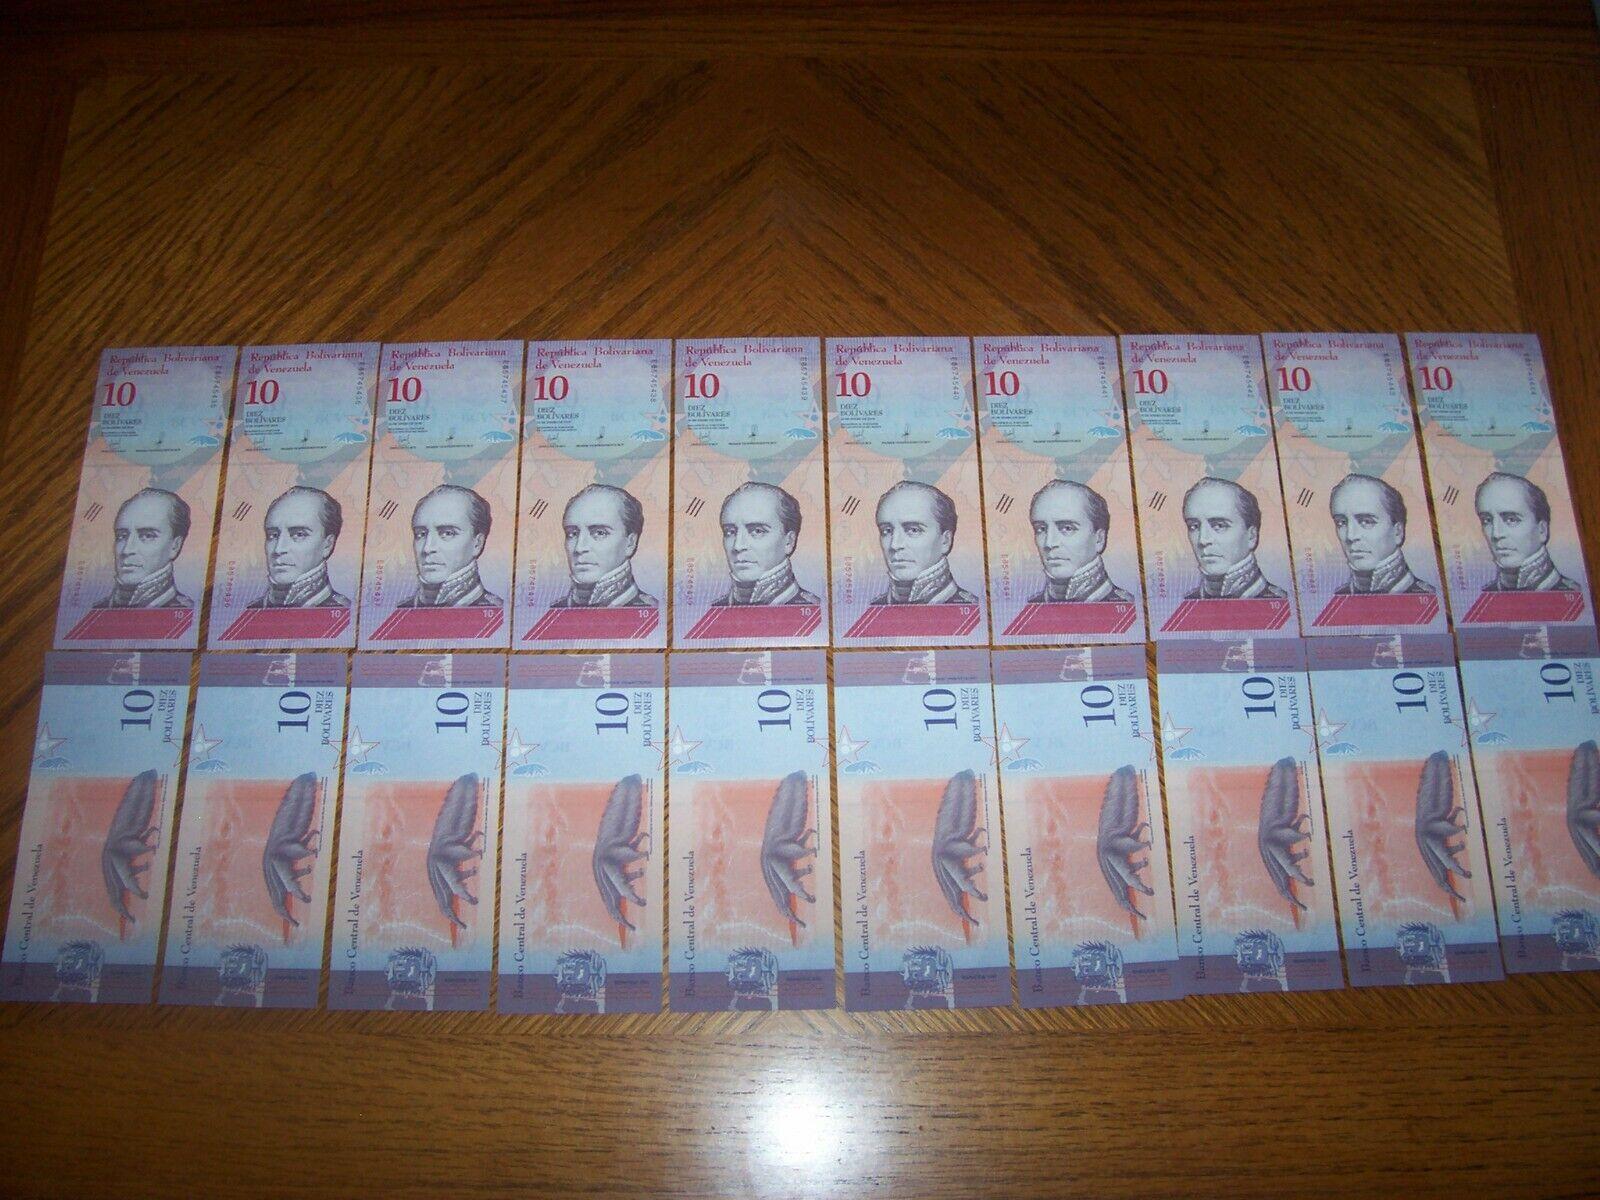 Lot Of 20 Pcs Bank Notes From Venezuela 10 Bolivares Uncirculated - $5.95